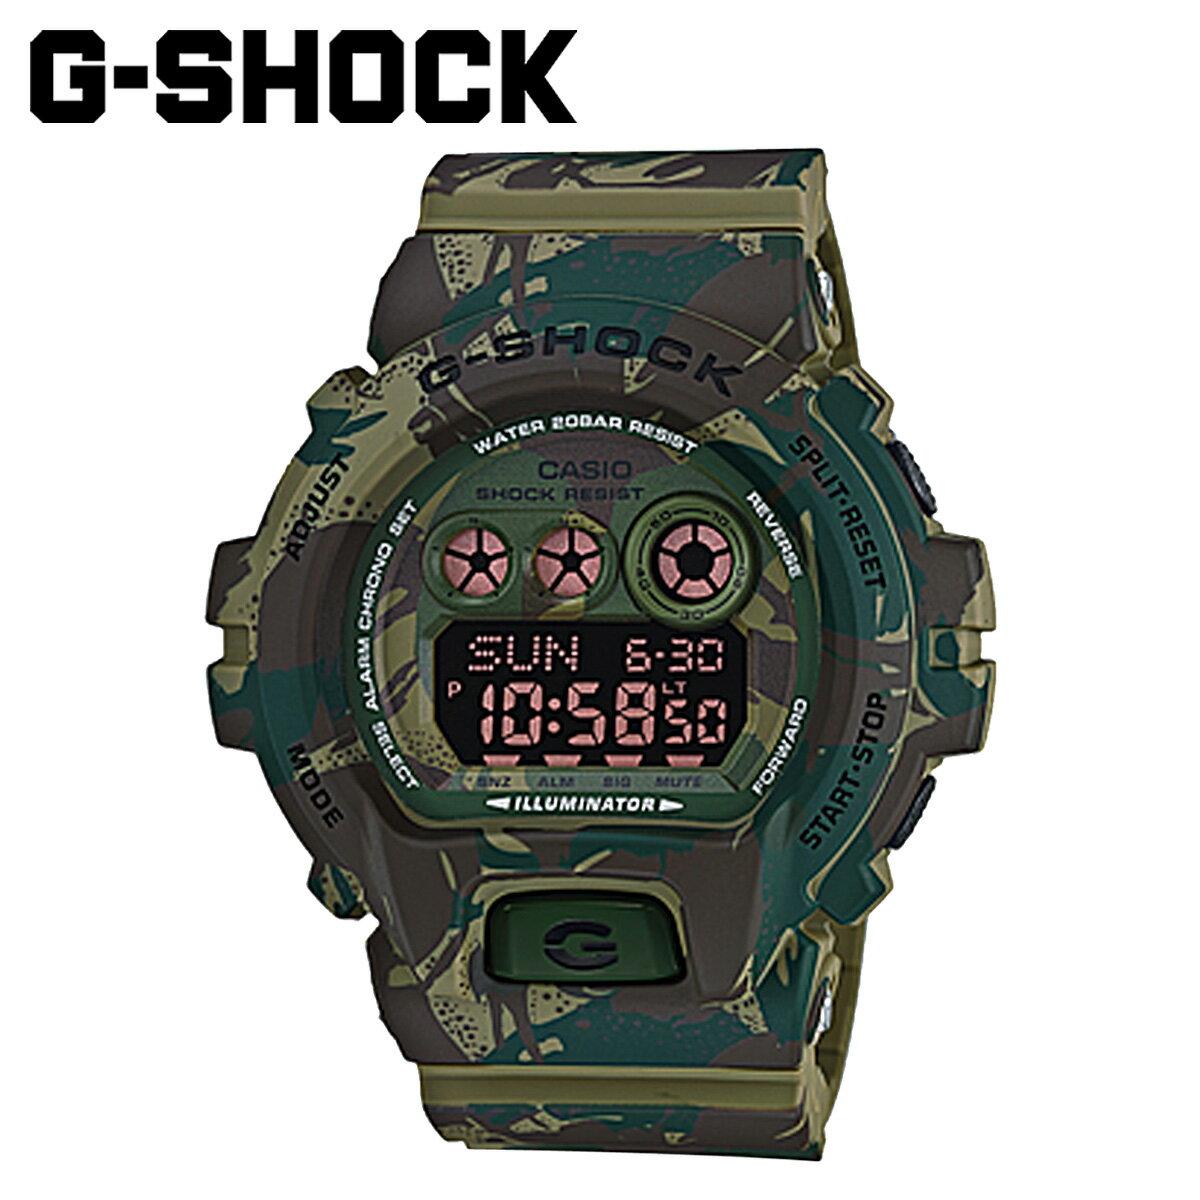 [SOLD OUT] カシオ CASIO G-SHOCK 腕時計  GD-X6900MC-3JR  ジーショック Gショック G-ショック  メンズ レディース  CASIO正規代理店  初回交換 送料無料  ジーショック 時計 メンズ g-shock mini レディース Gショック 腕時計 正規  通販